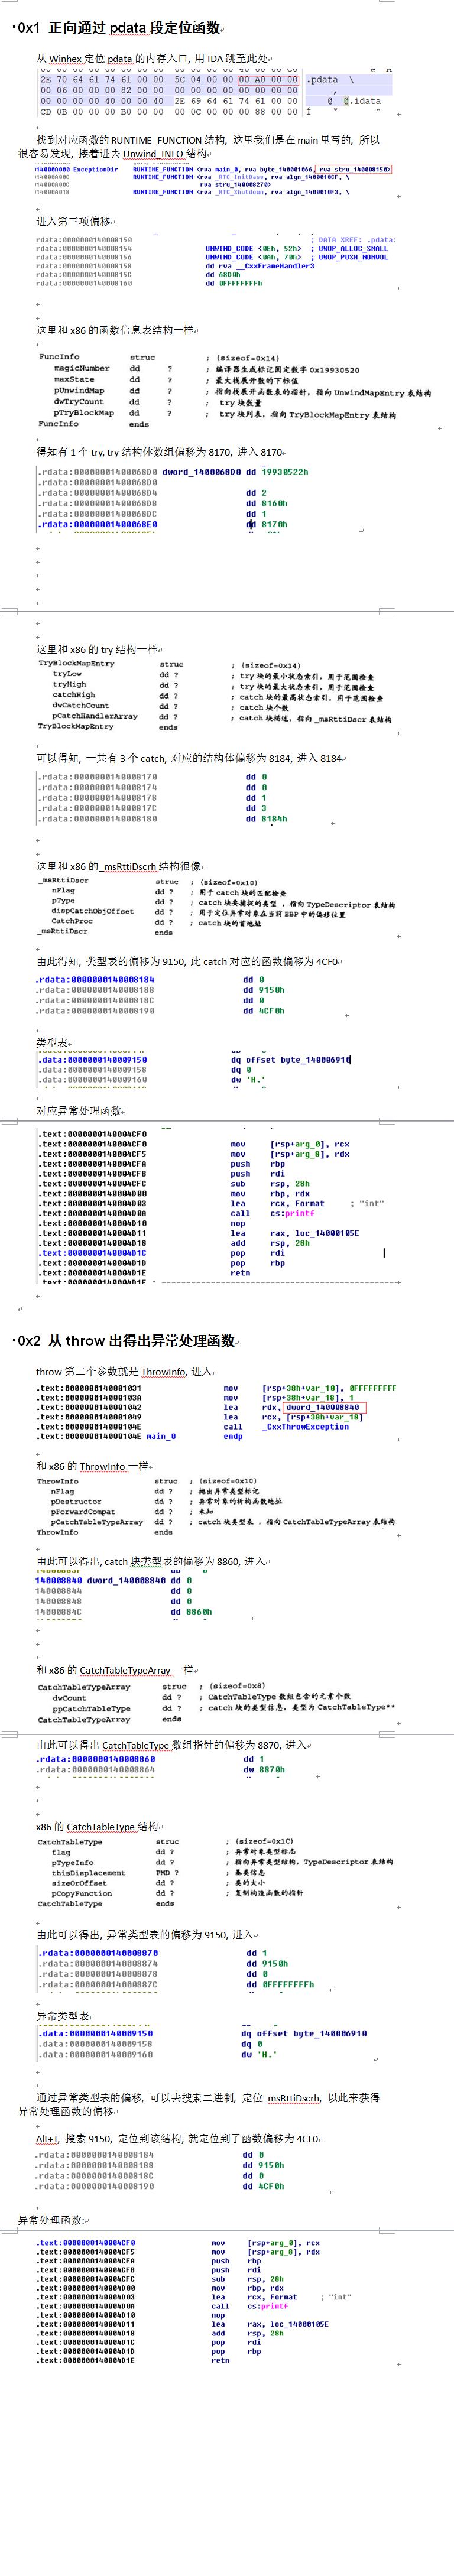 x64定位异常代码.png